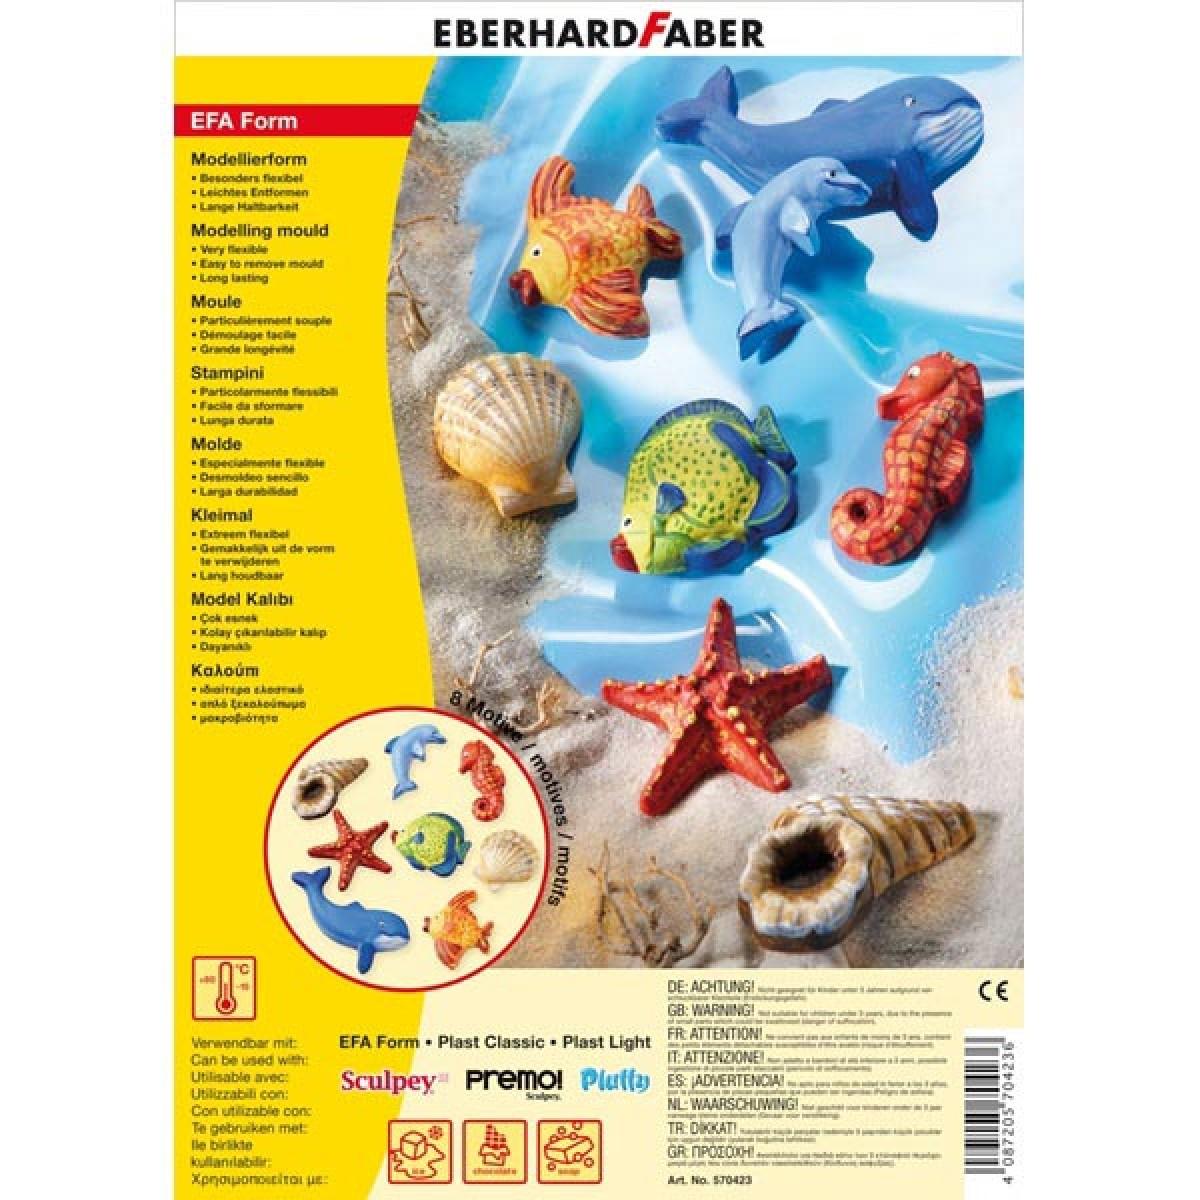 Eberhard Faber Καλούπι Sea World Είδη Ζωγραφικής